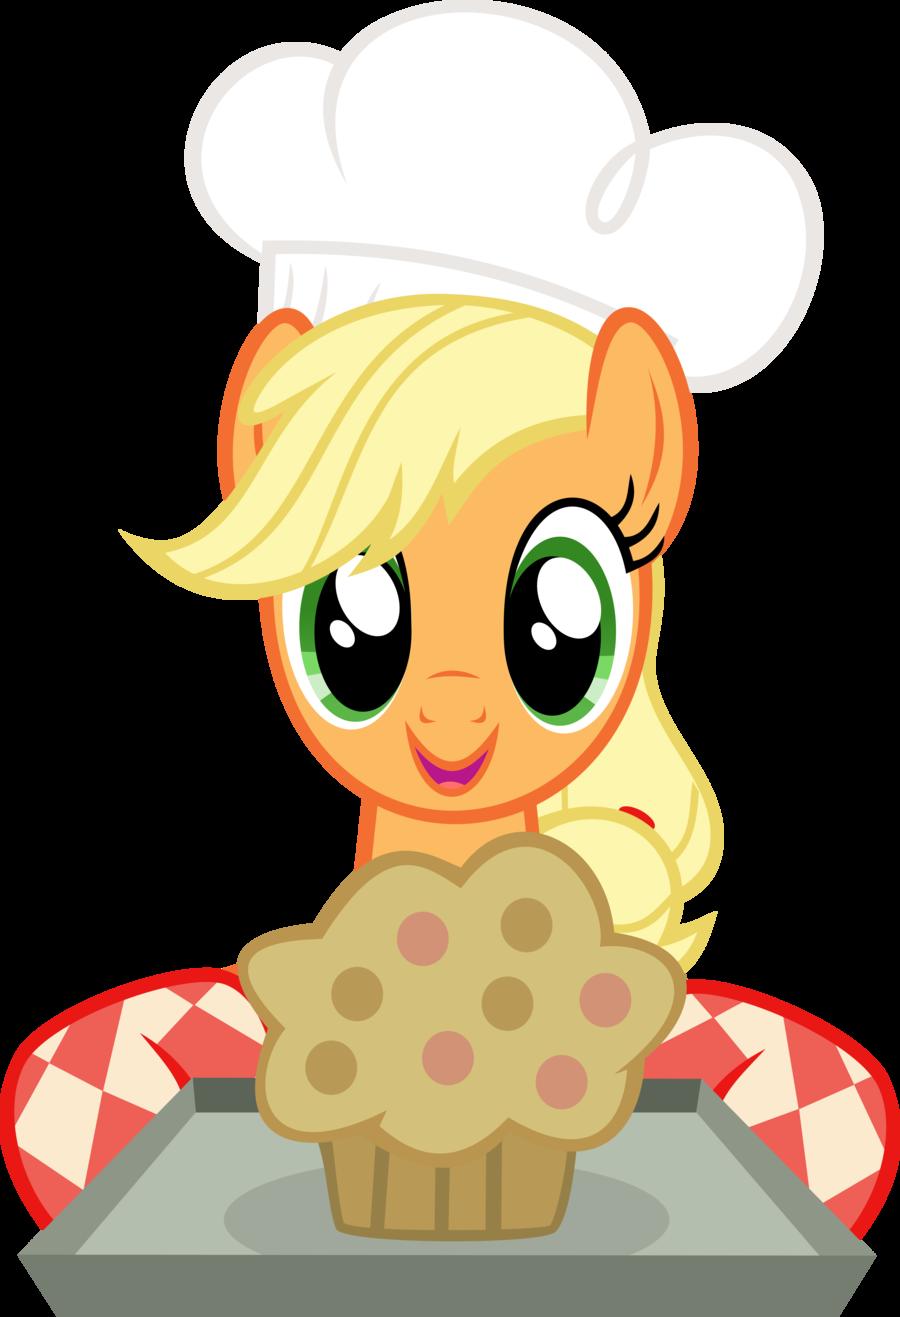 applejack artist abydos. Muffins clipart sweet